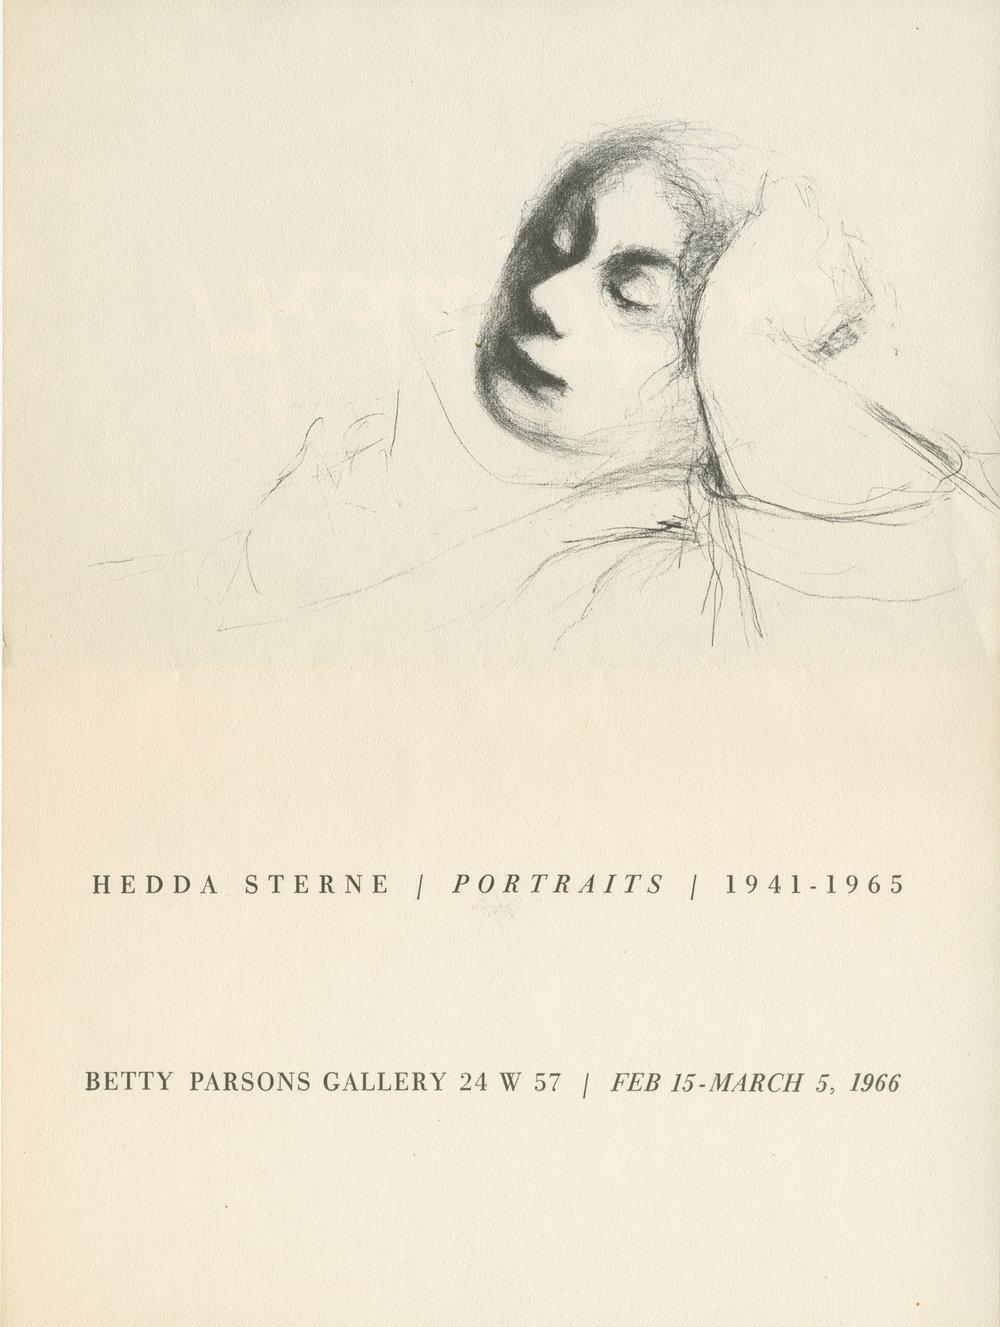 hedda-sterne-exhibition-1966.jpg